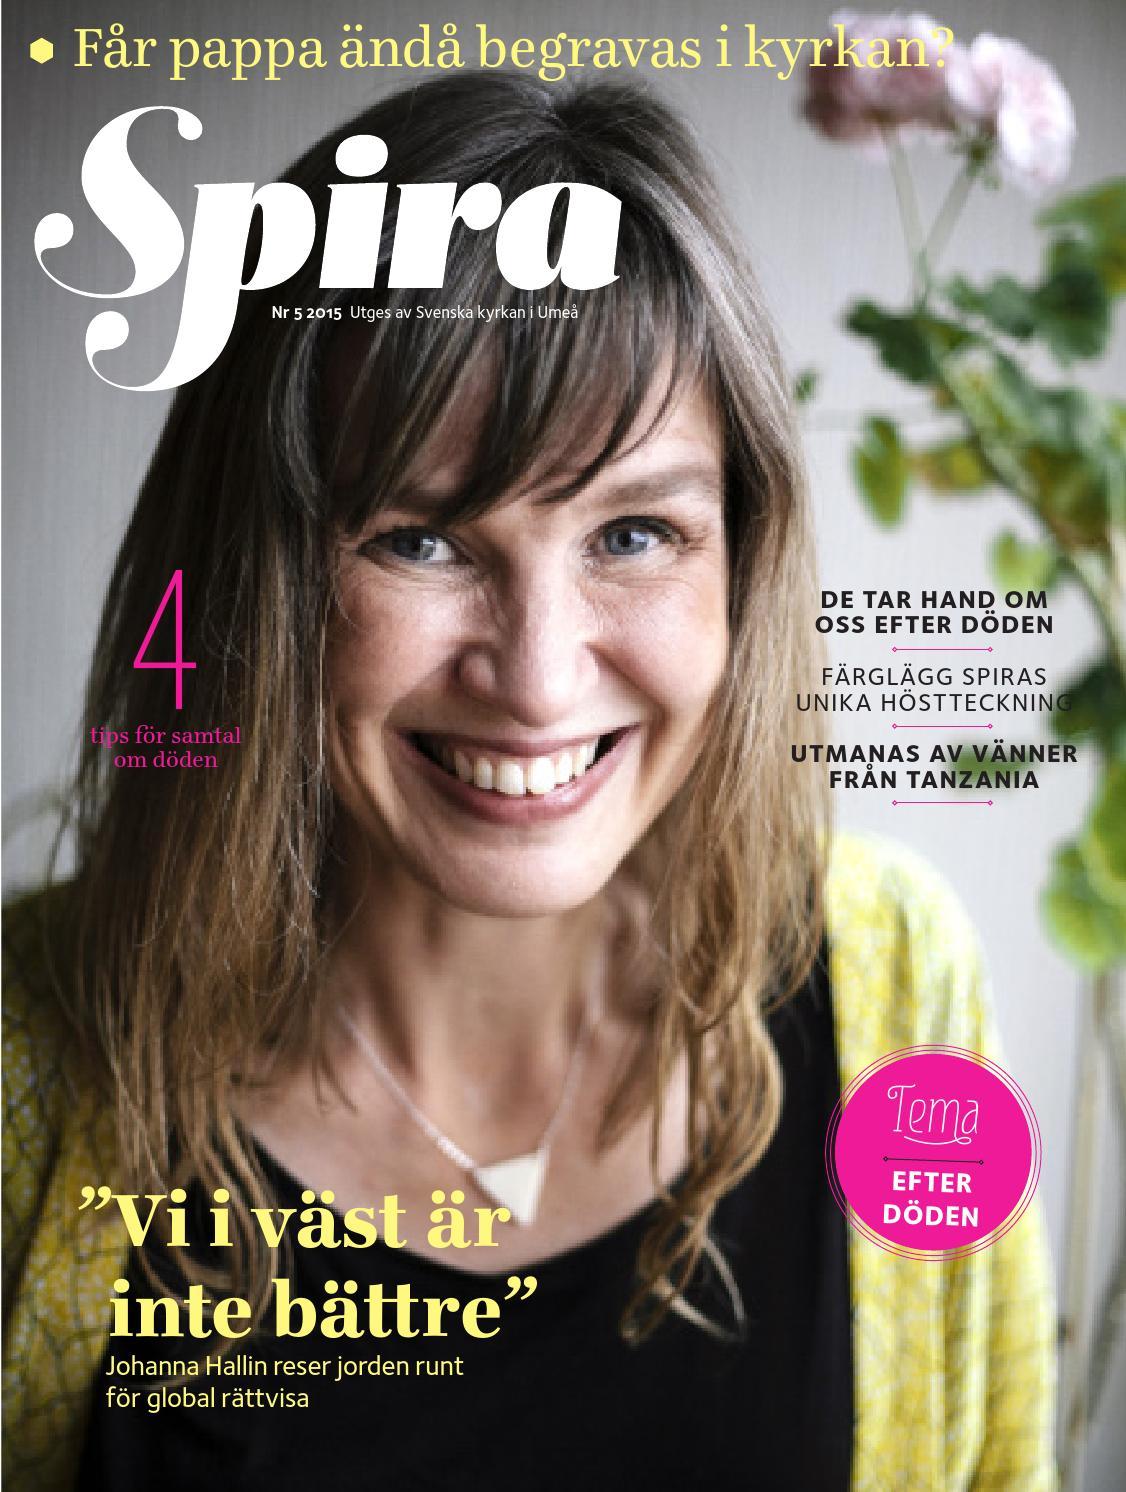 Siv Thyra Margareta Ferm, Fgelstigen 10, Vnnsby | unam.net